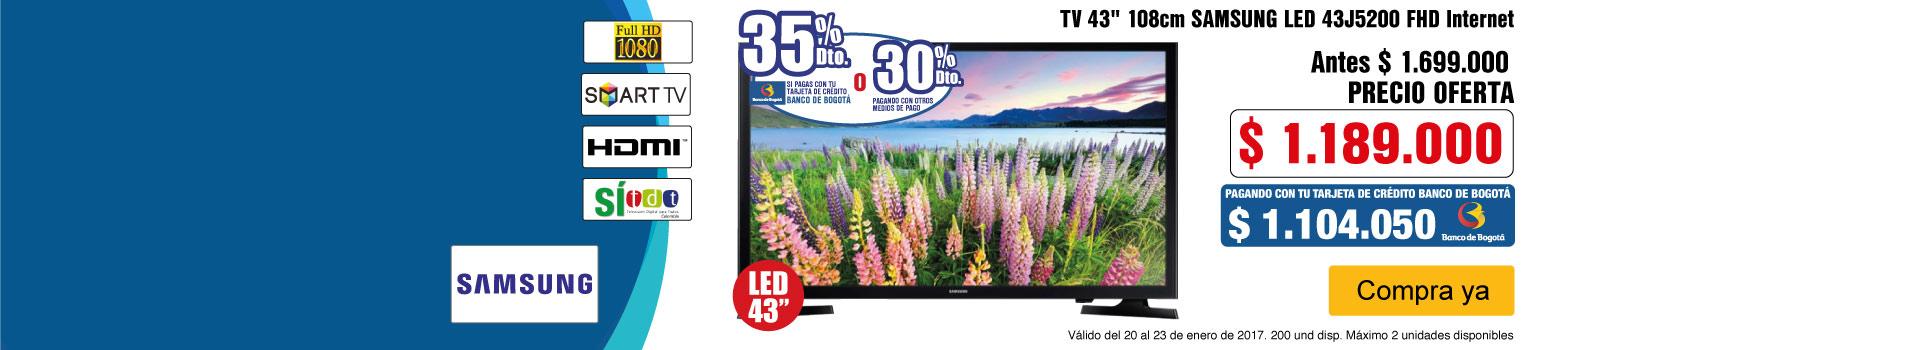 CAT AK-1-TELEVISOR SG 43J52-TV-ENERO20/23